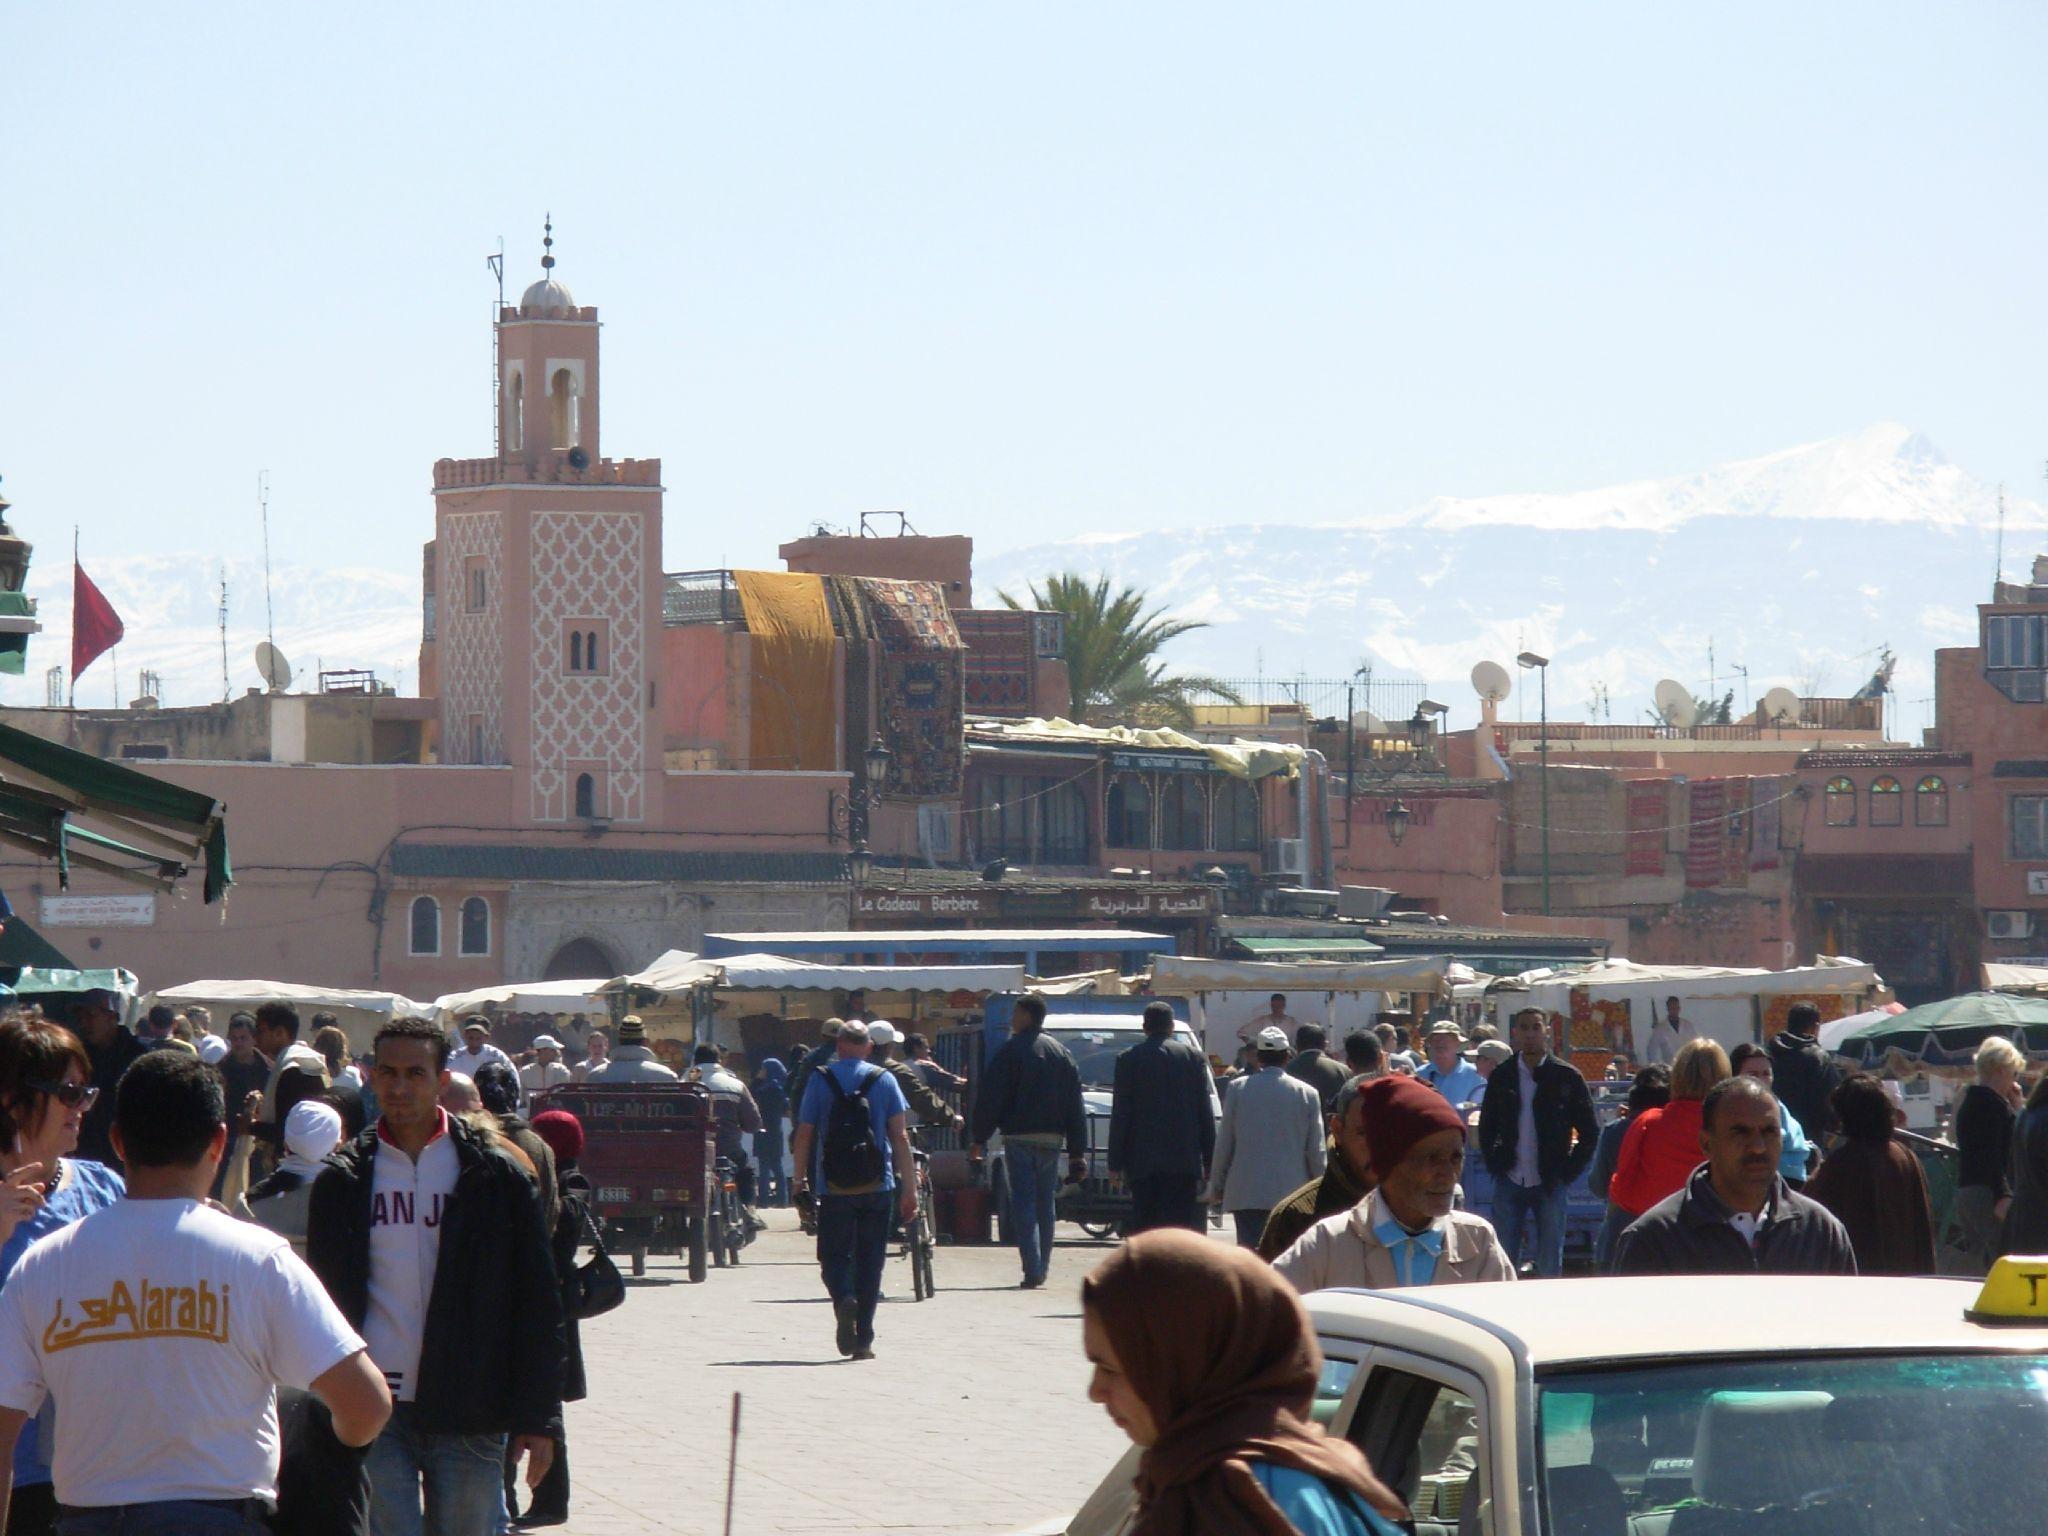 Maroc ... Marrakech, place Jemaa el fna